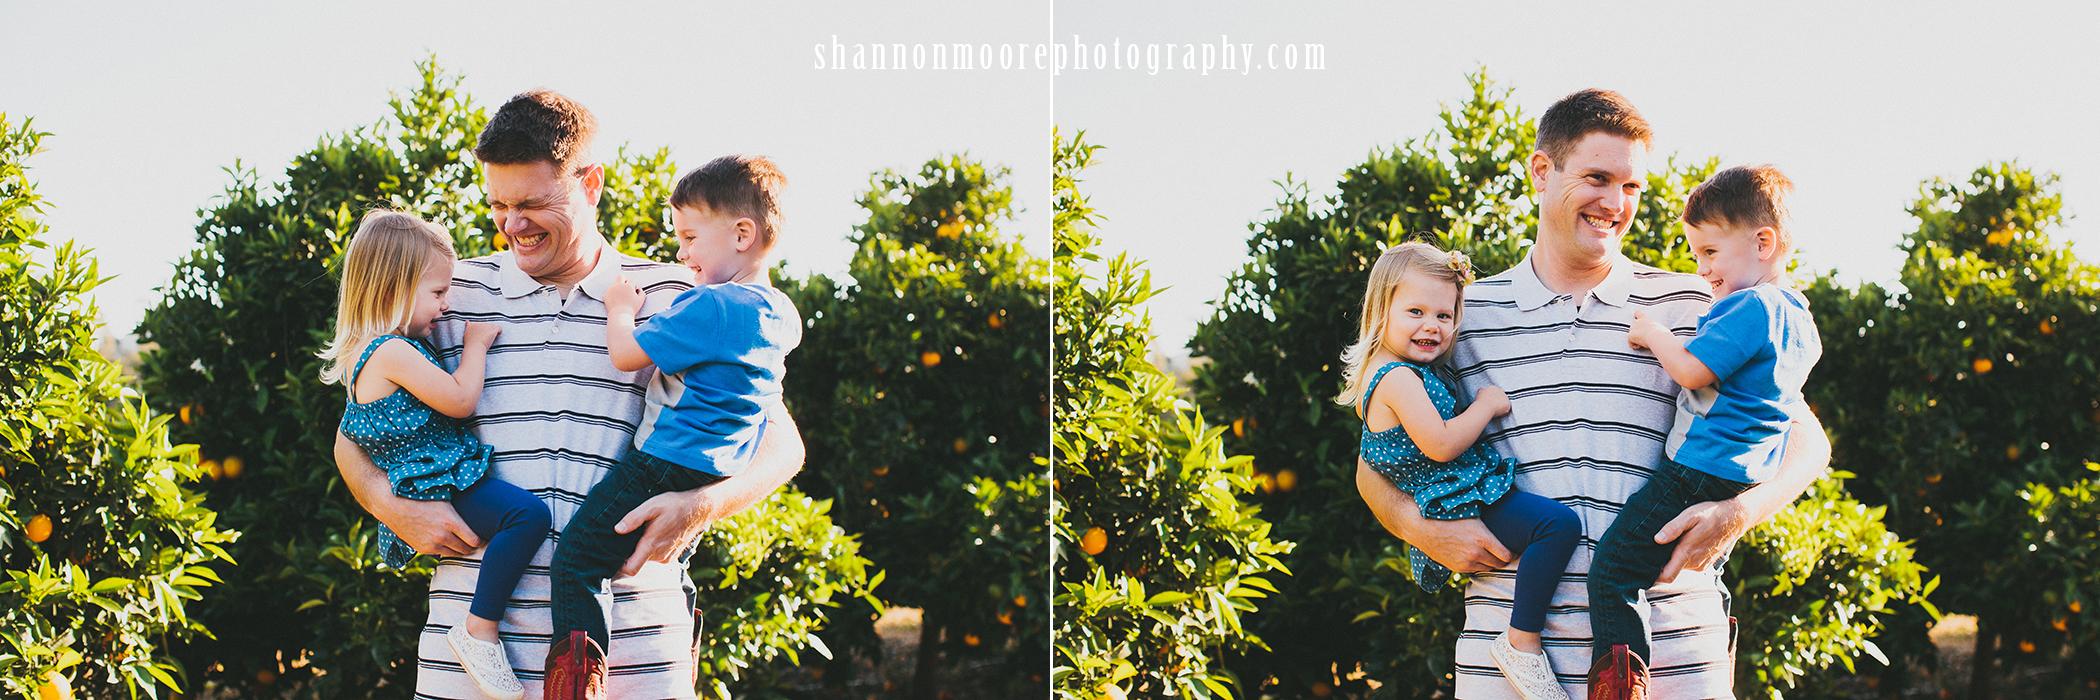 ShannonMoorePhotography-FamilyPhotography-SanLuisObispo-Ca-10